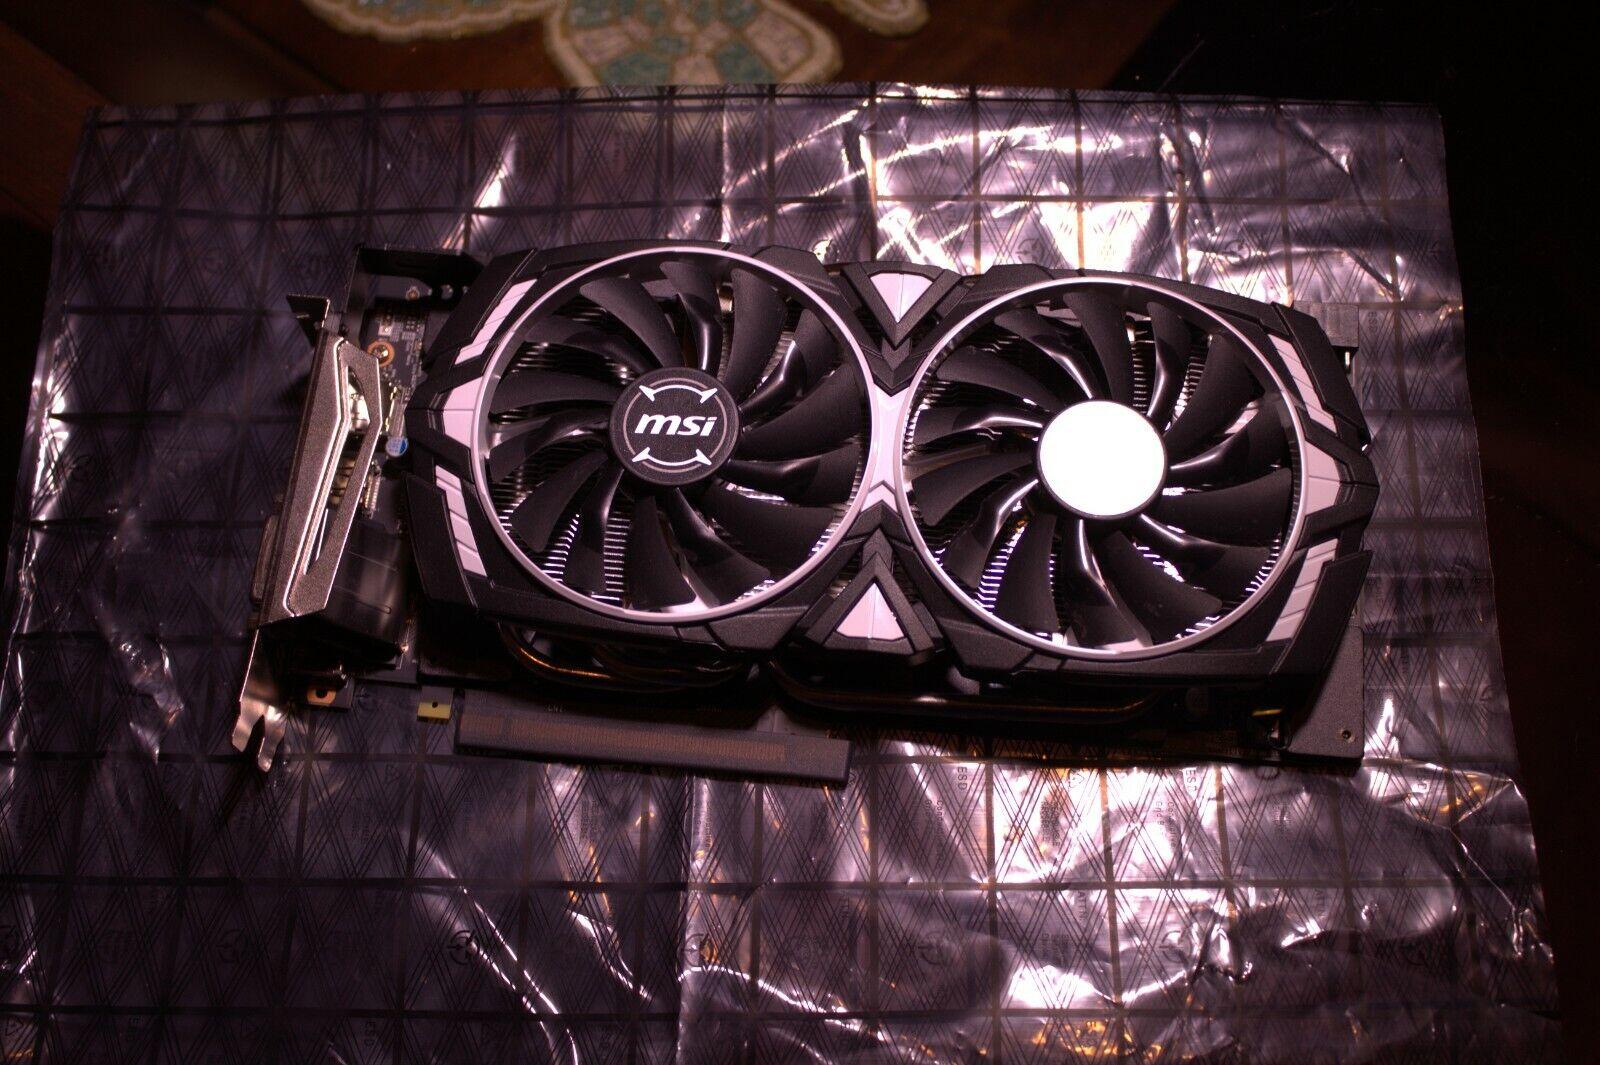 MSI Gaming GeForce GTX 1070 8GB GDDR5 Graphics Card